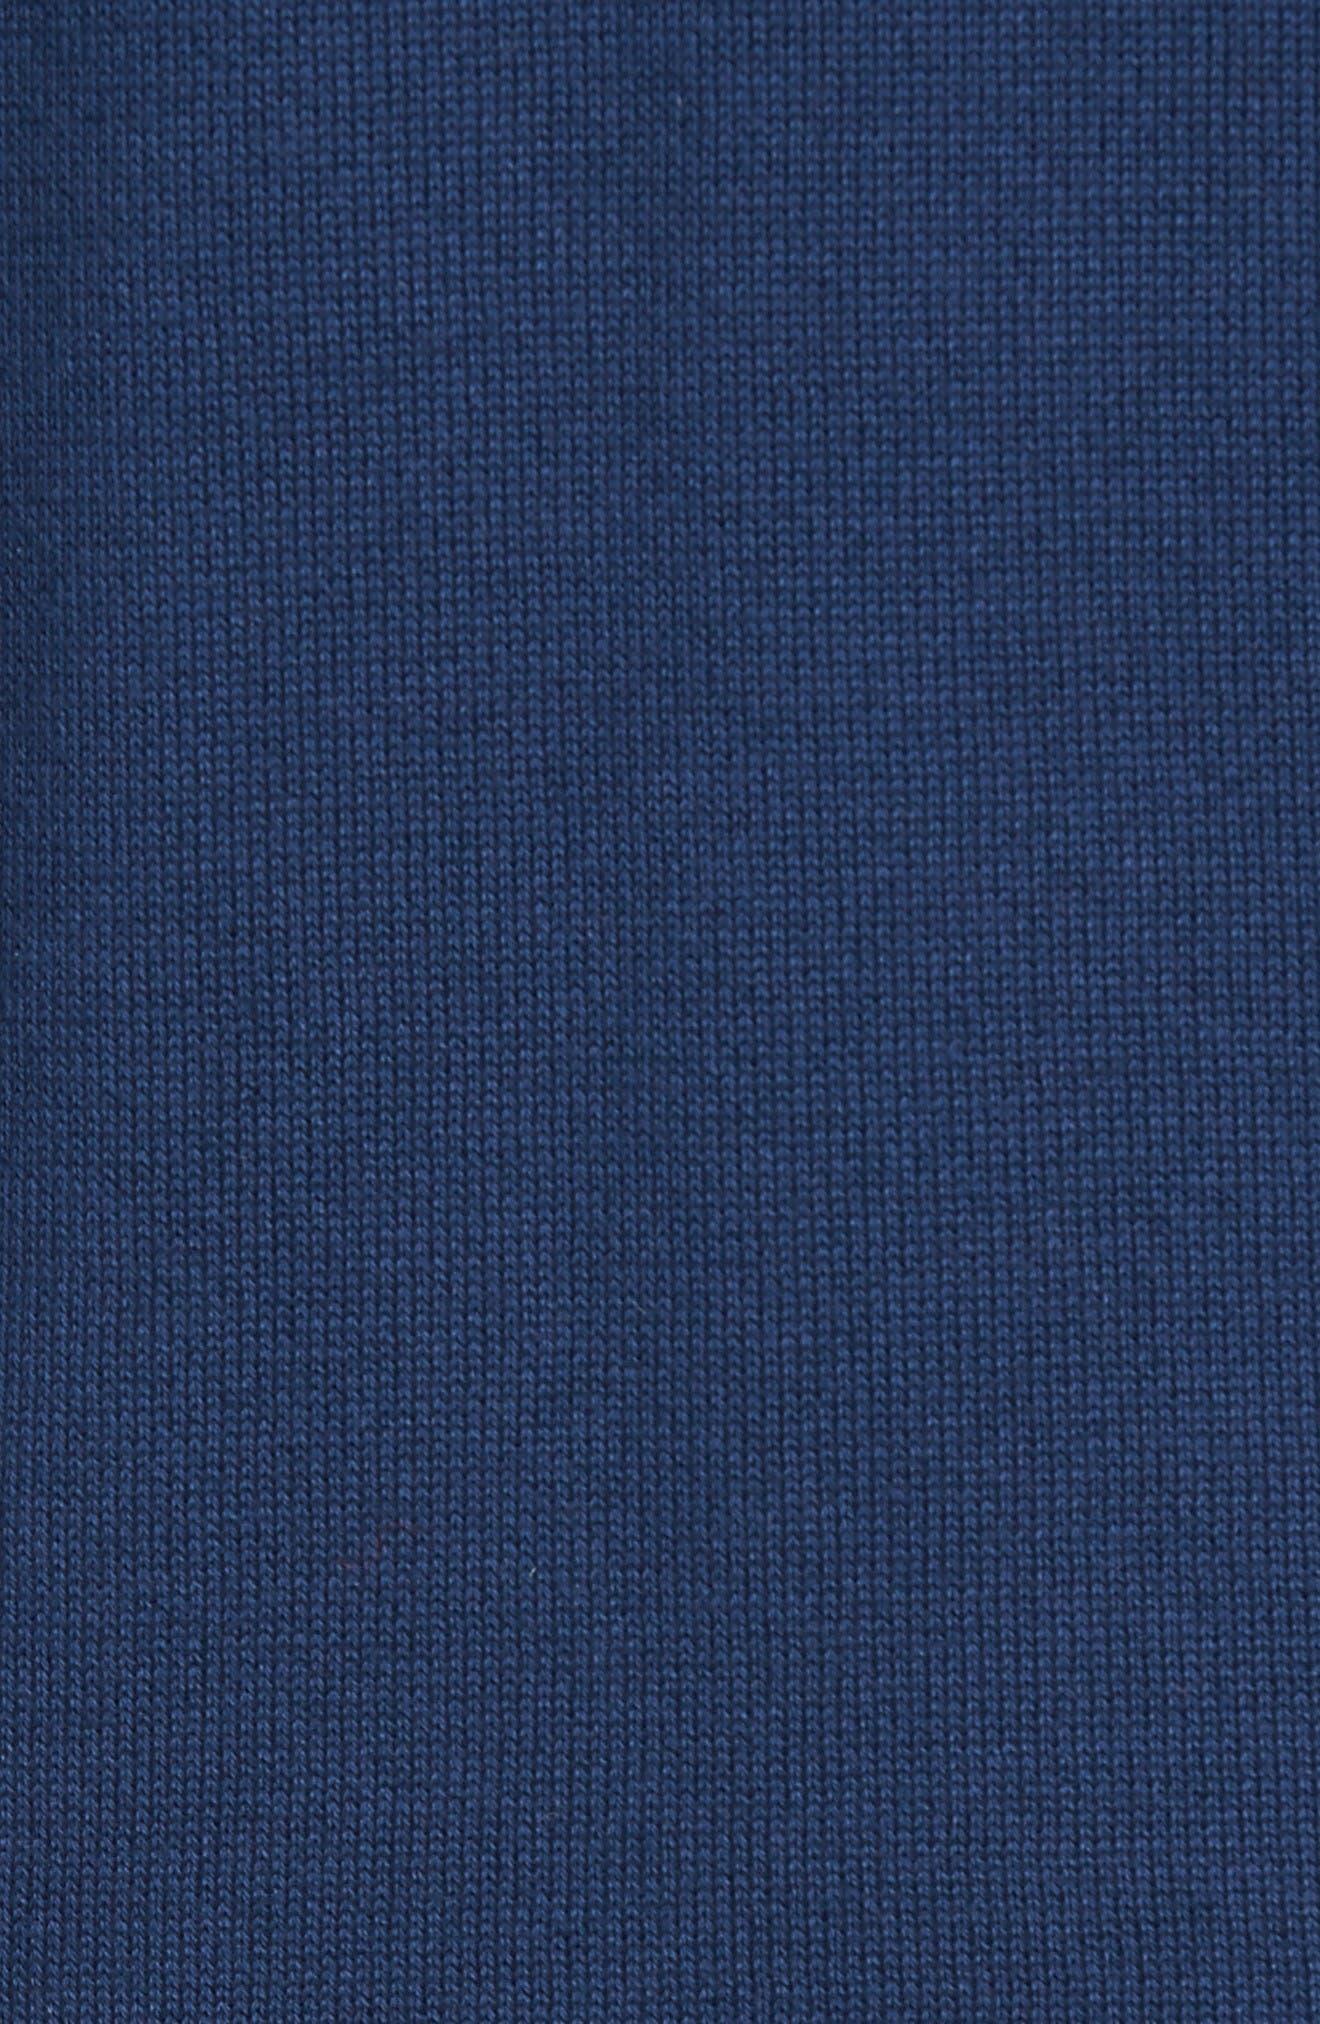 Piqué Jersey V-Neck Sweater,                             Alternate thumbnail 5, color,                             Summer Navy